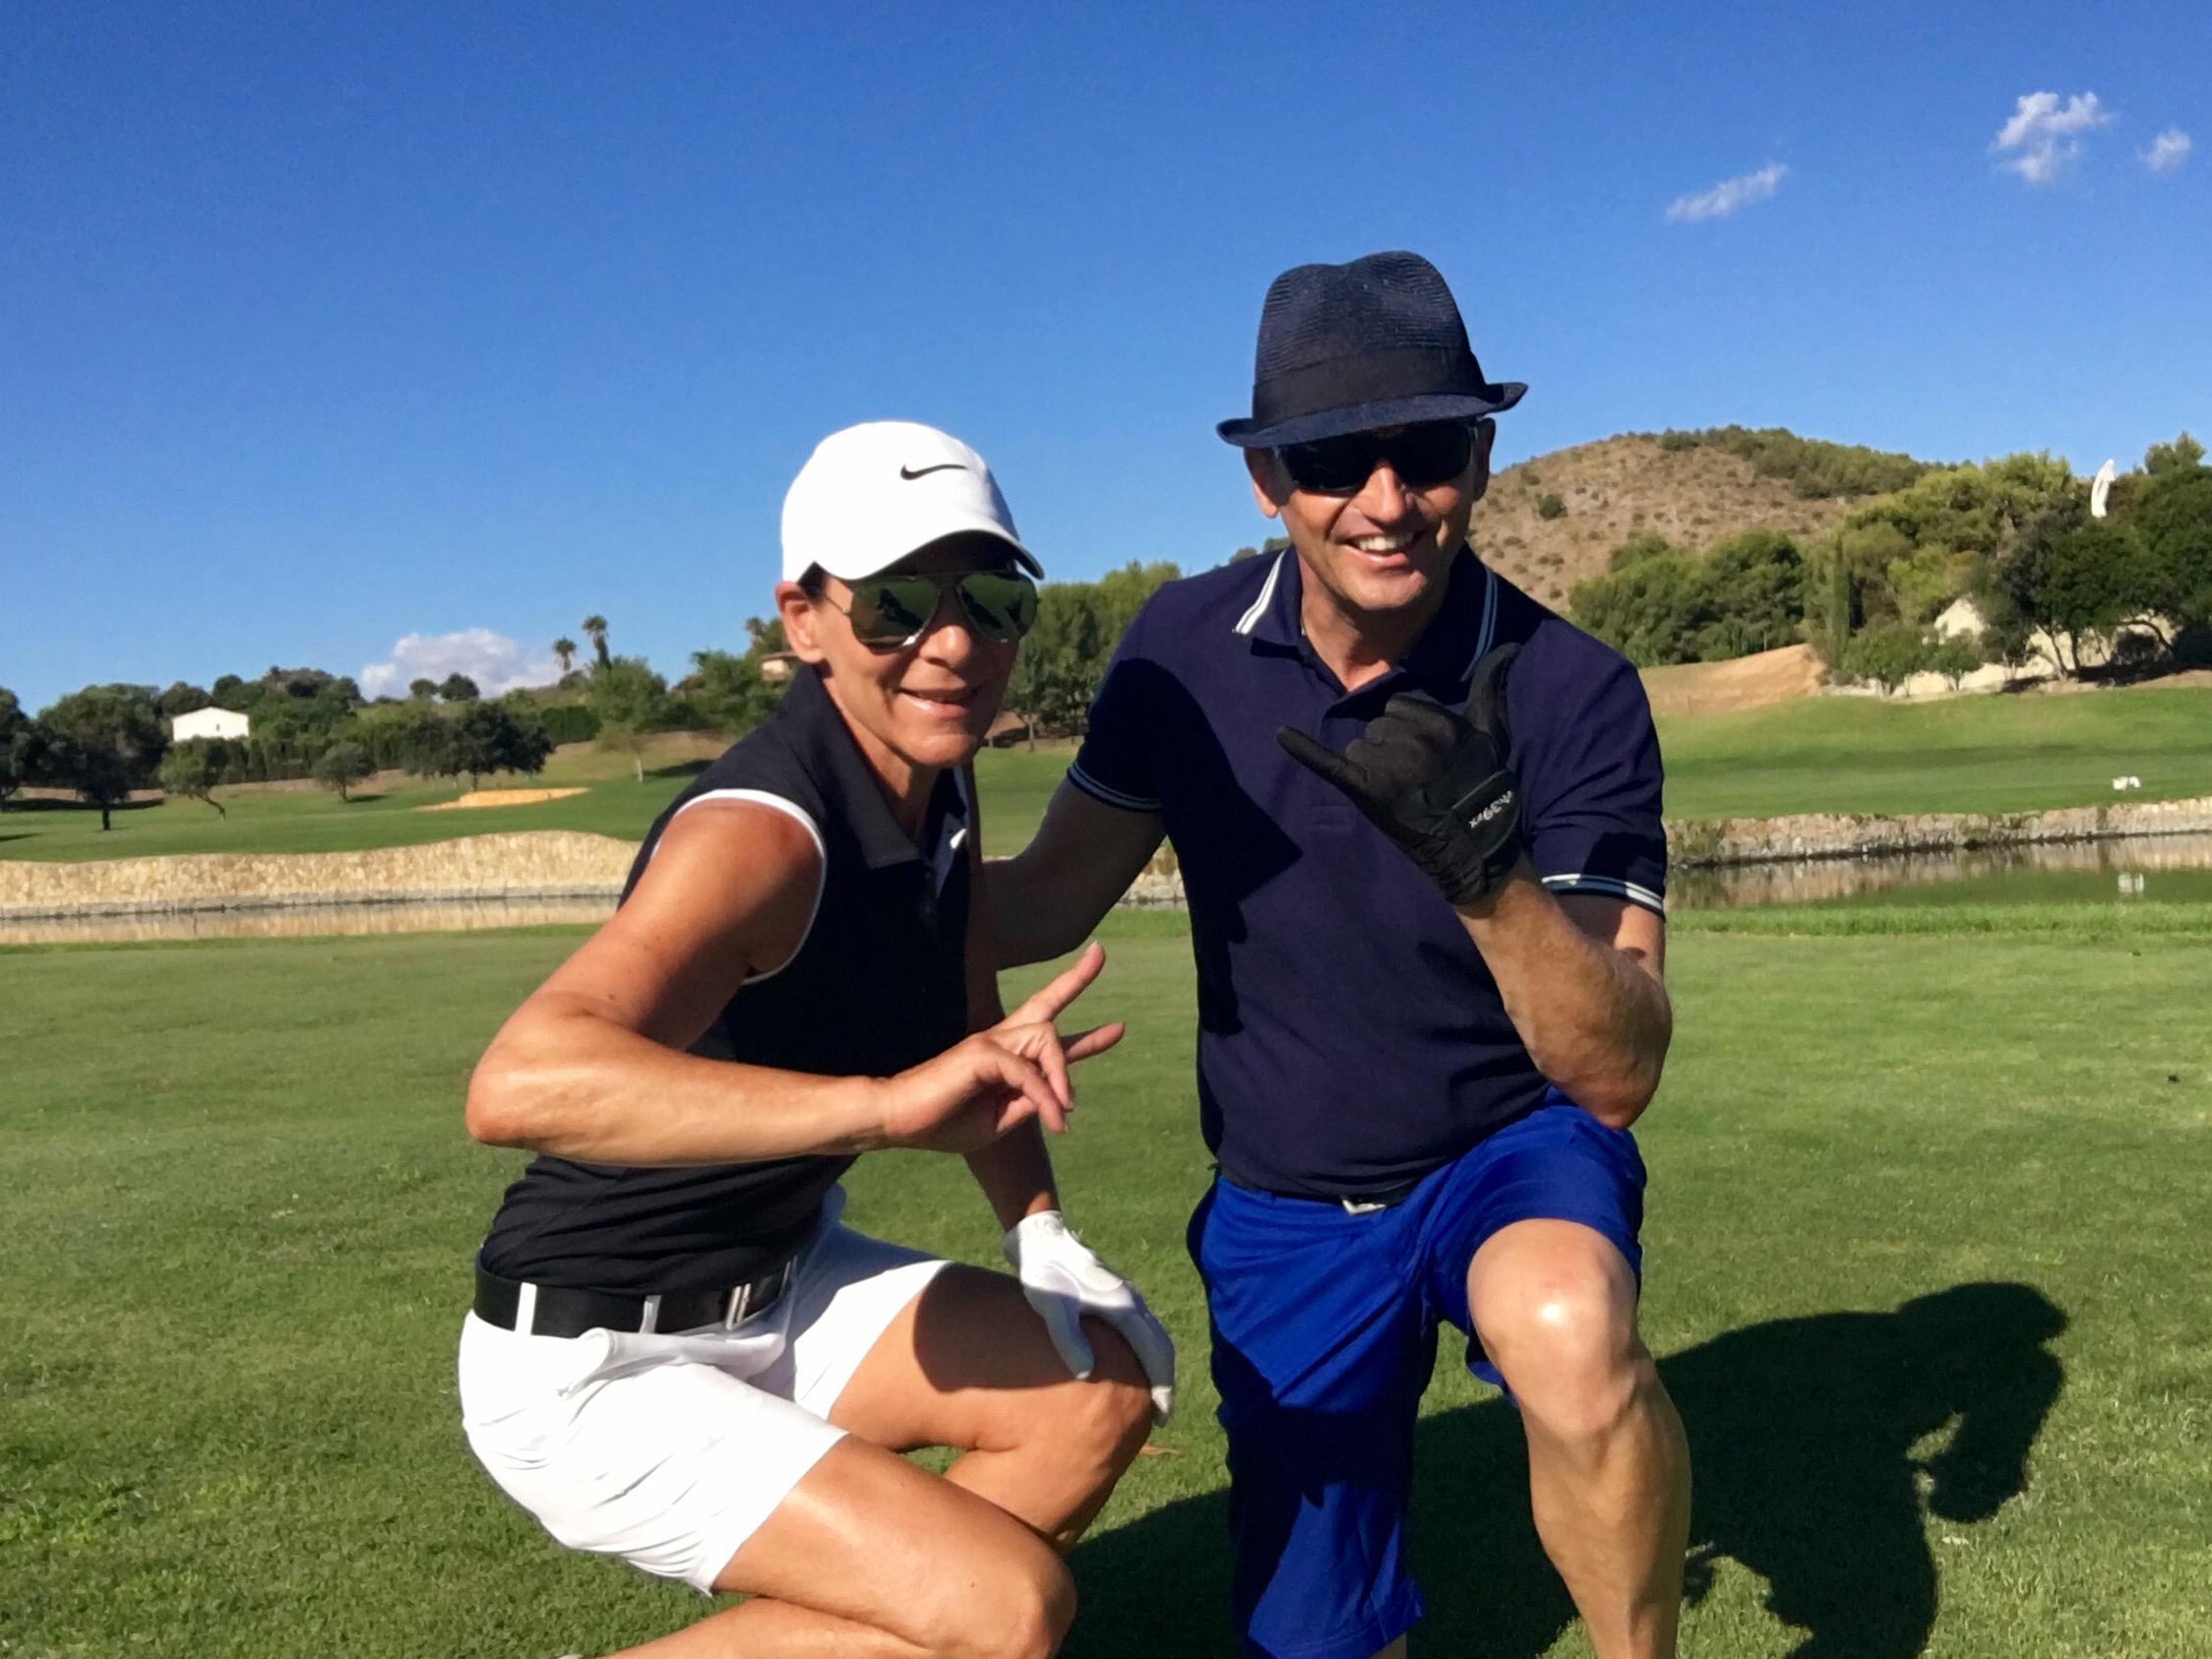 Avatar of golfer named Lucia Schmid